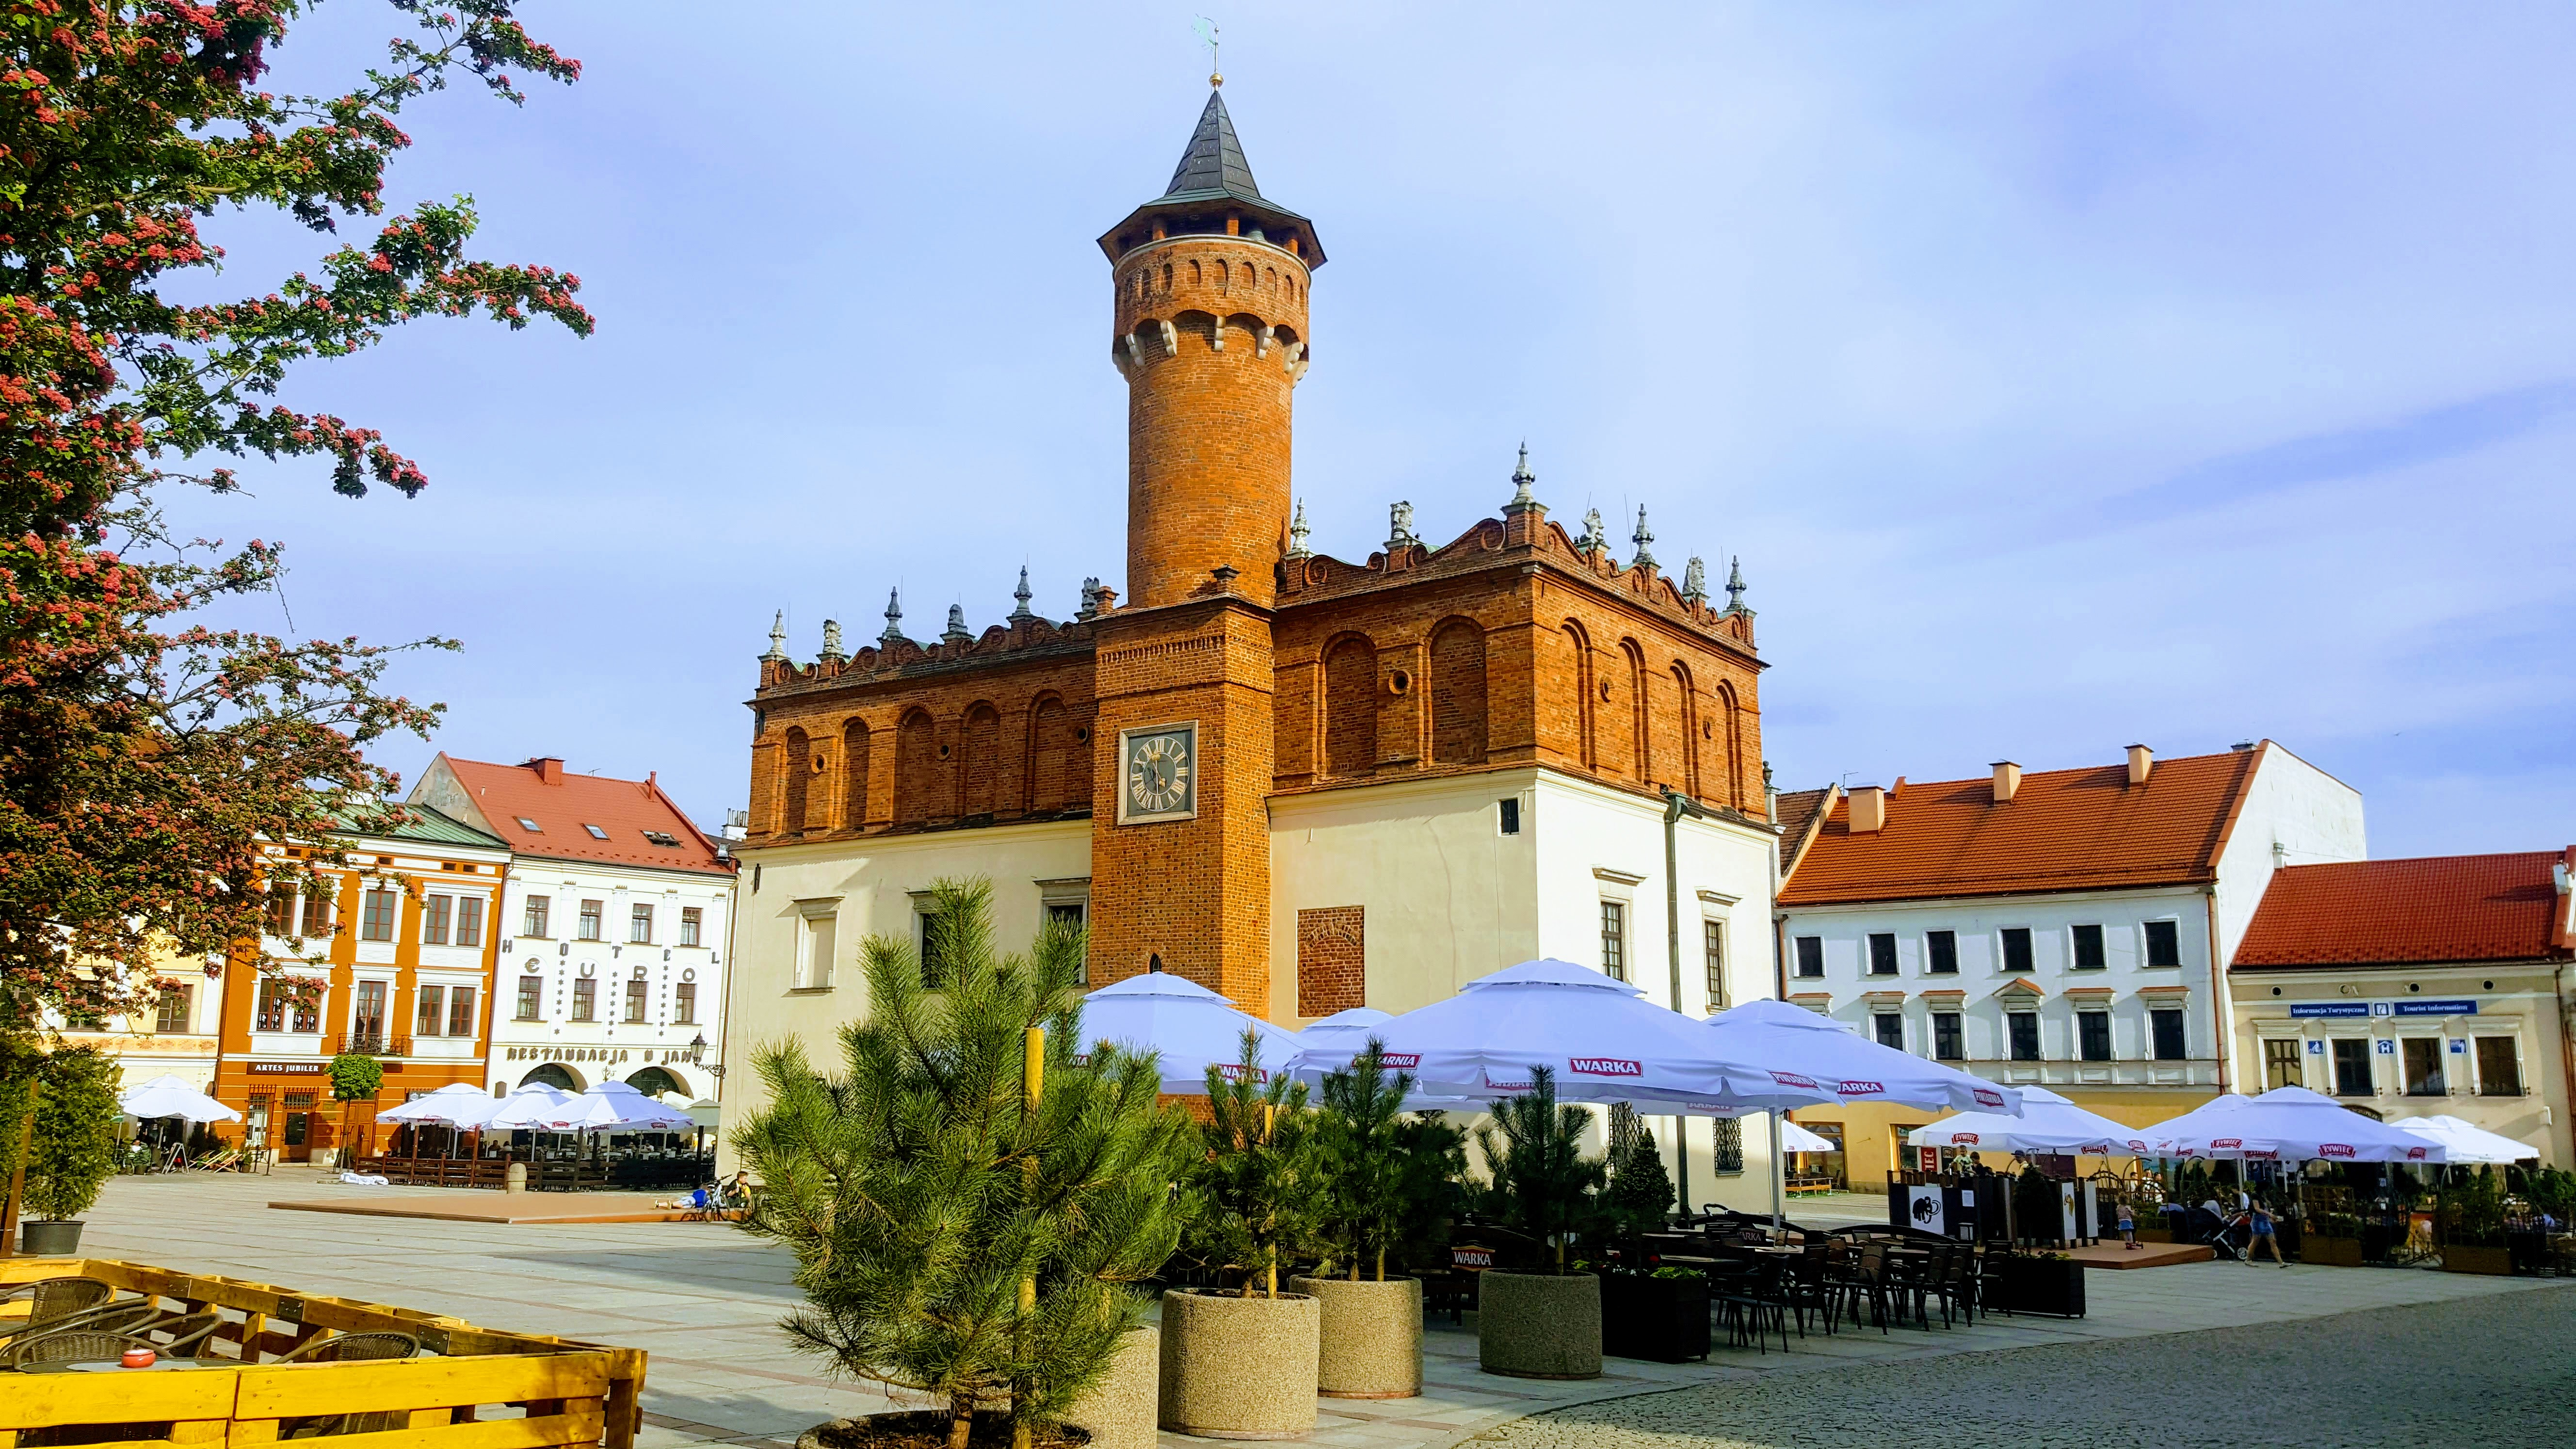 Tarnow (taar-noov)